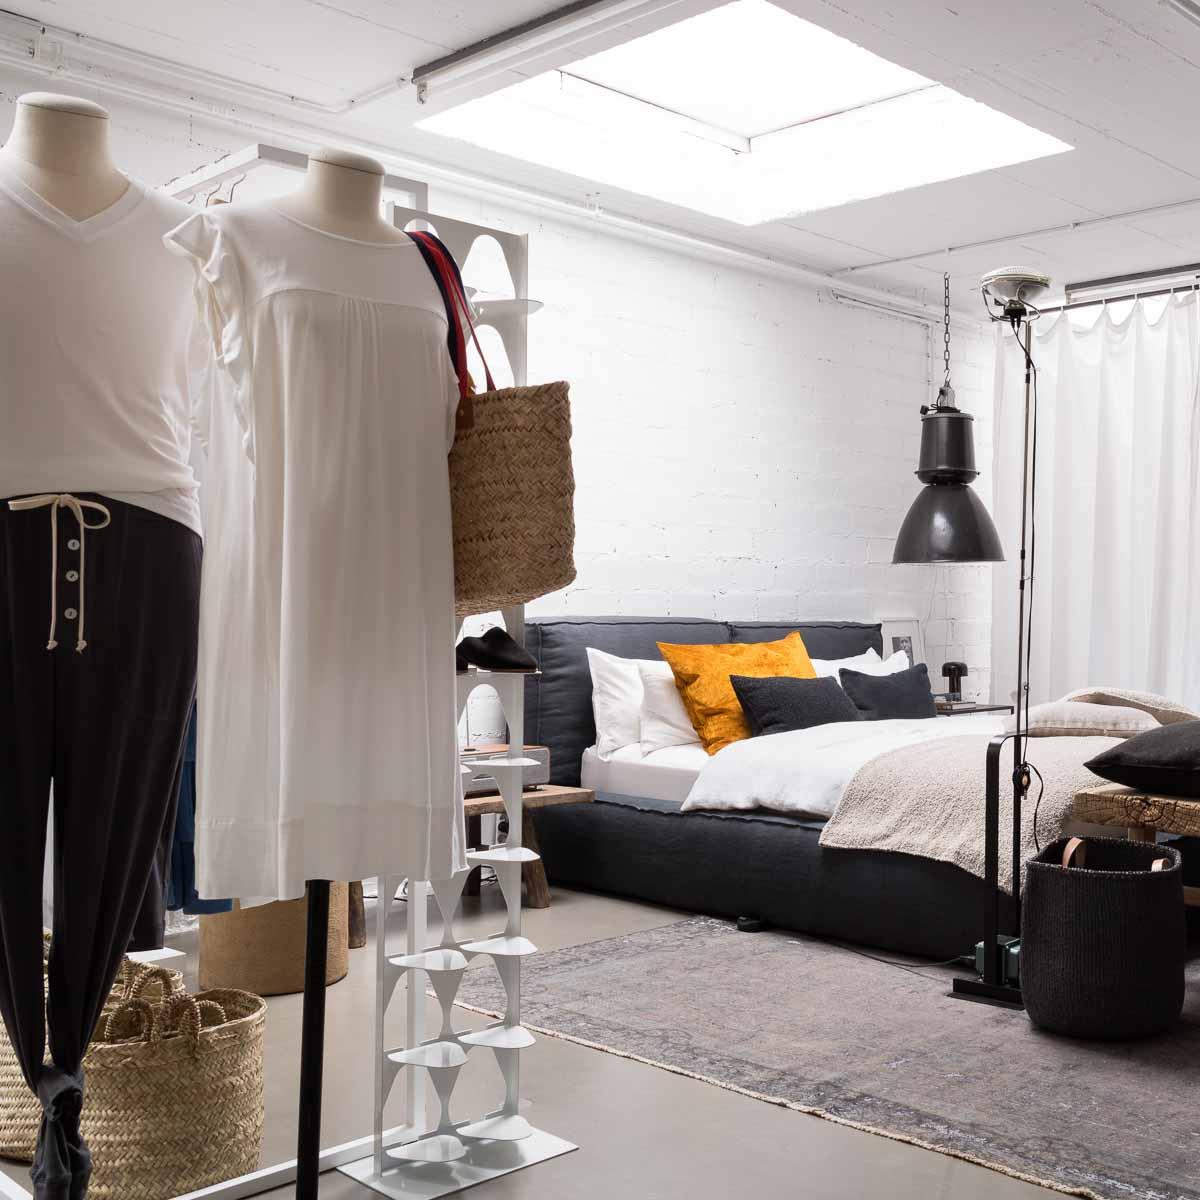 Sunday in Bed in München-Lehel-5